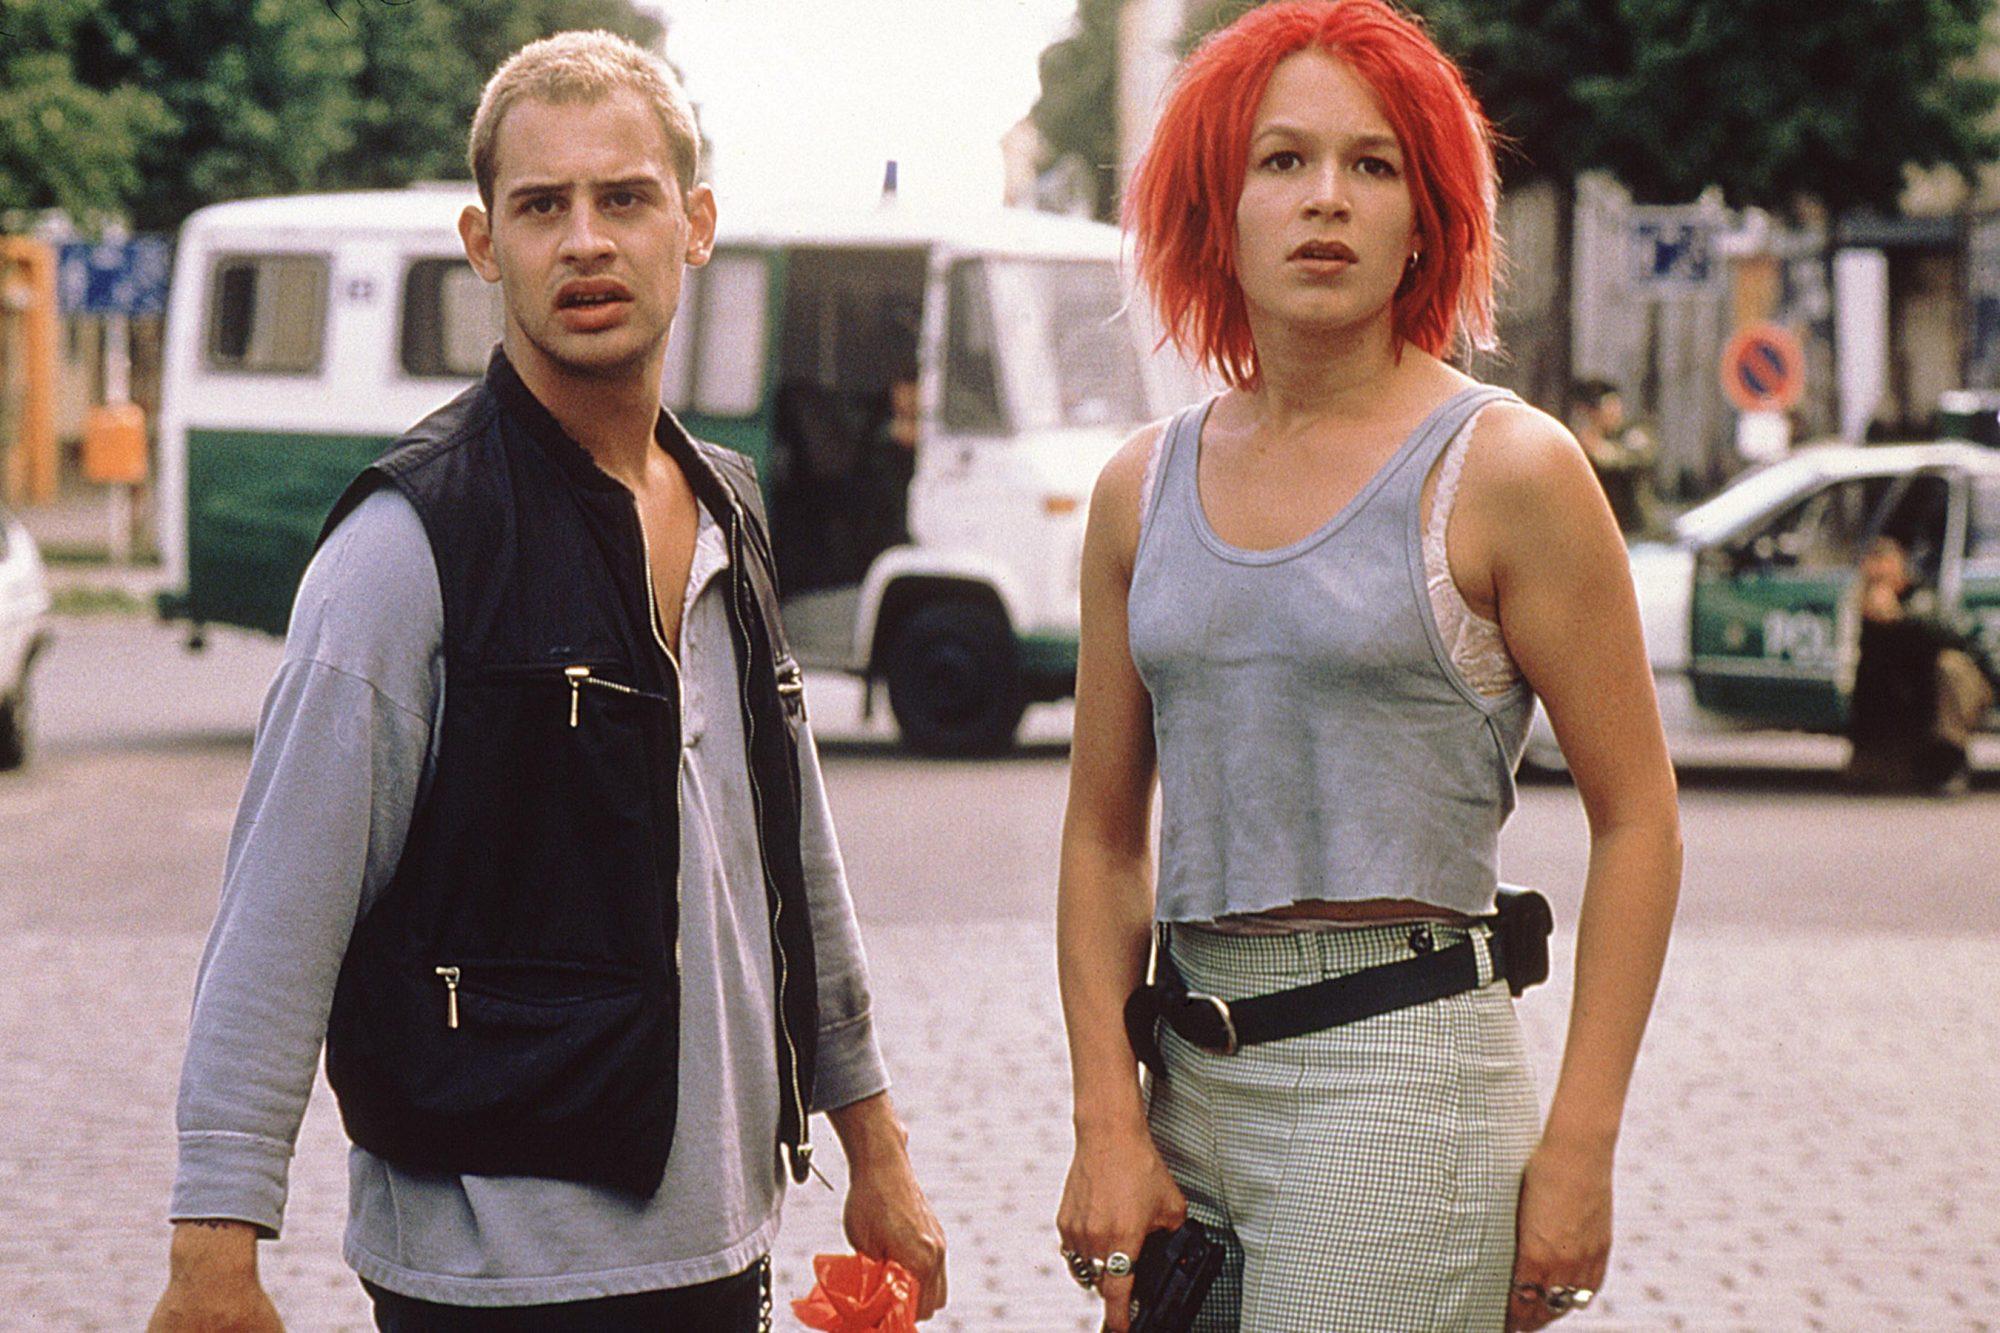 RUN LOLA RUN, (aka LOLA RENNT), Moritz Bleibtreu, Franka Potente, 1998. ©Sony Pictures Classics/cour